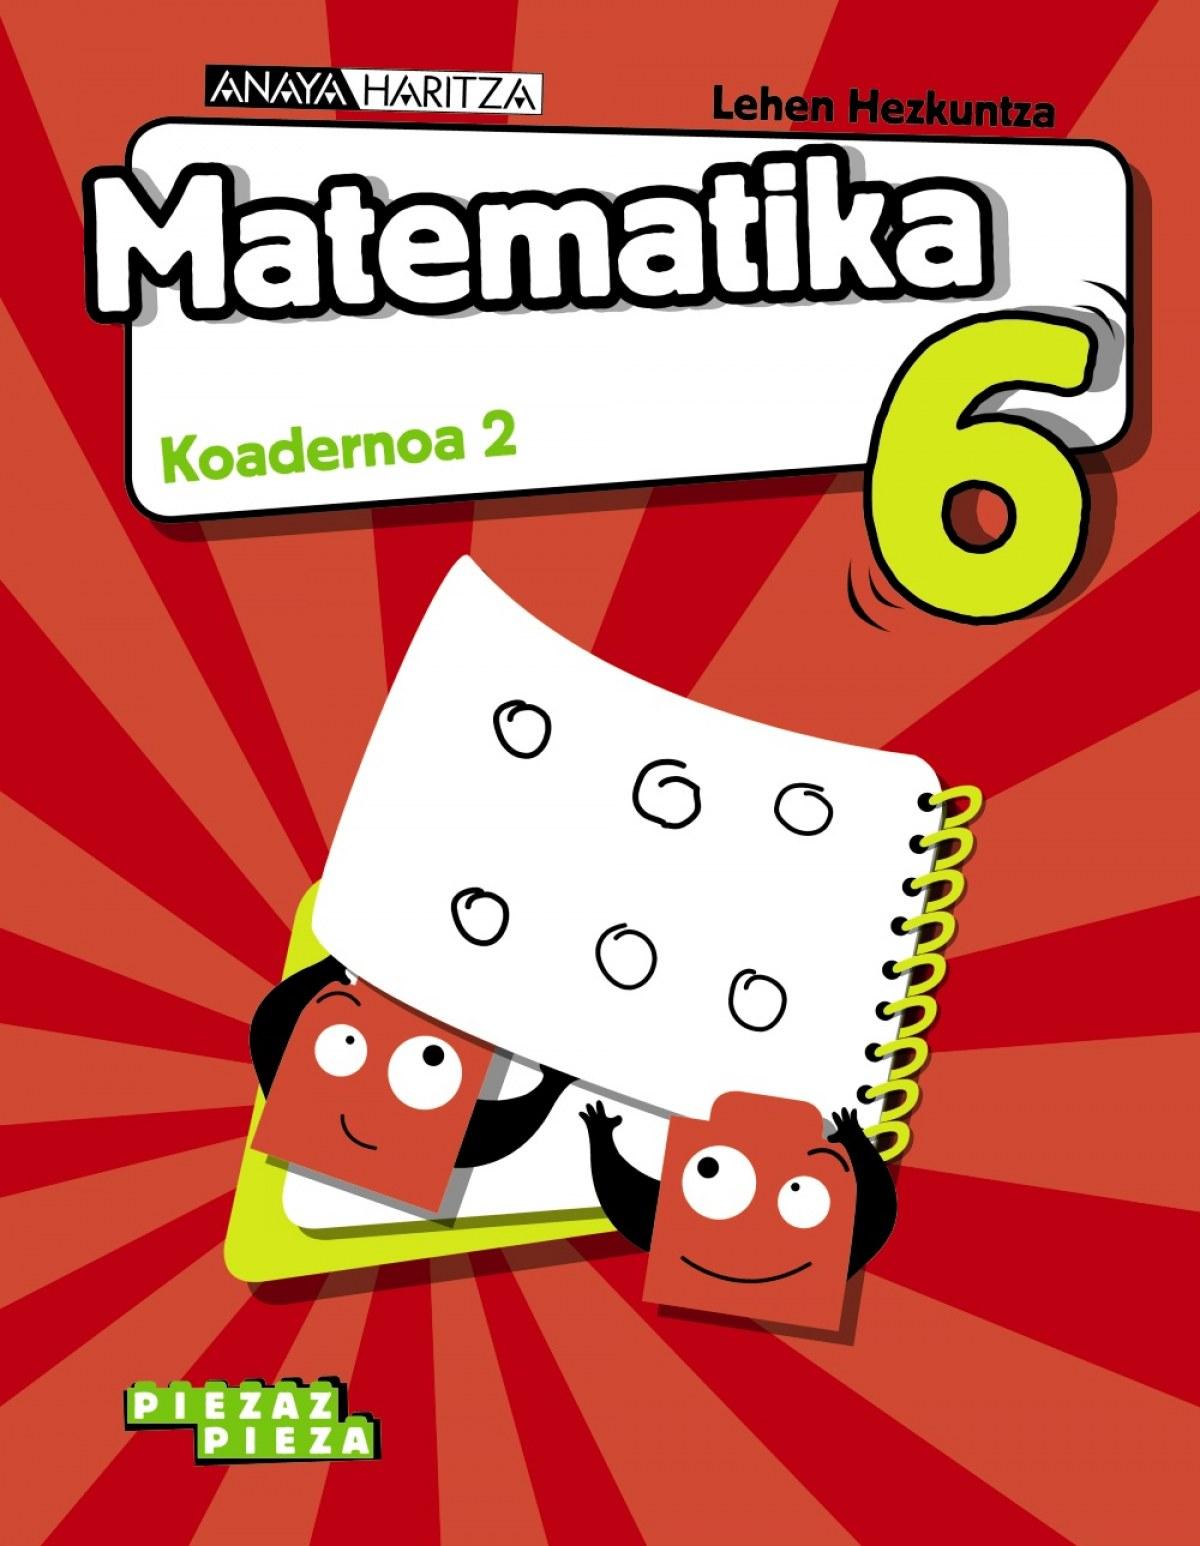 Matematika 6. Koadernoa 2.